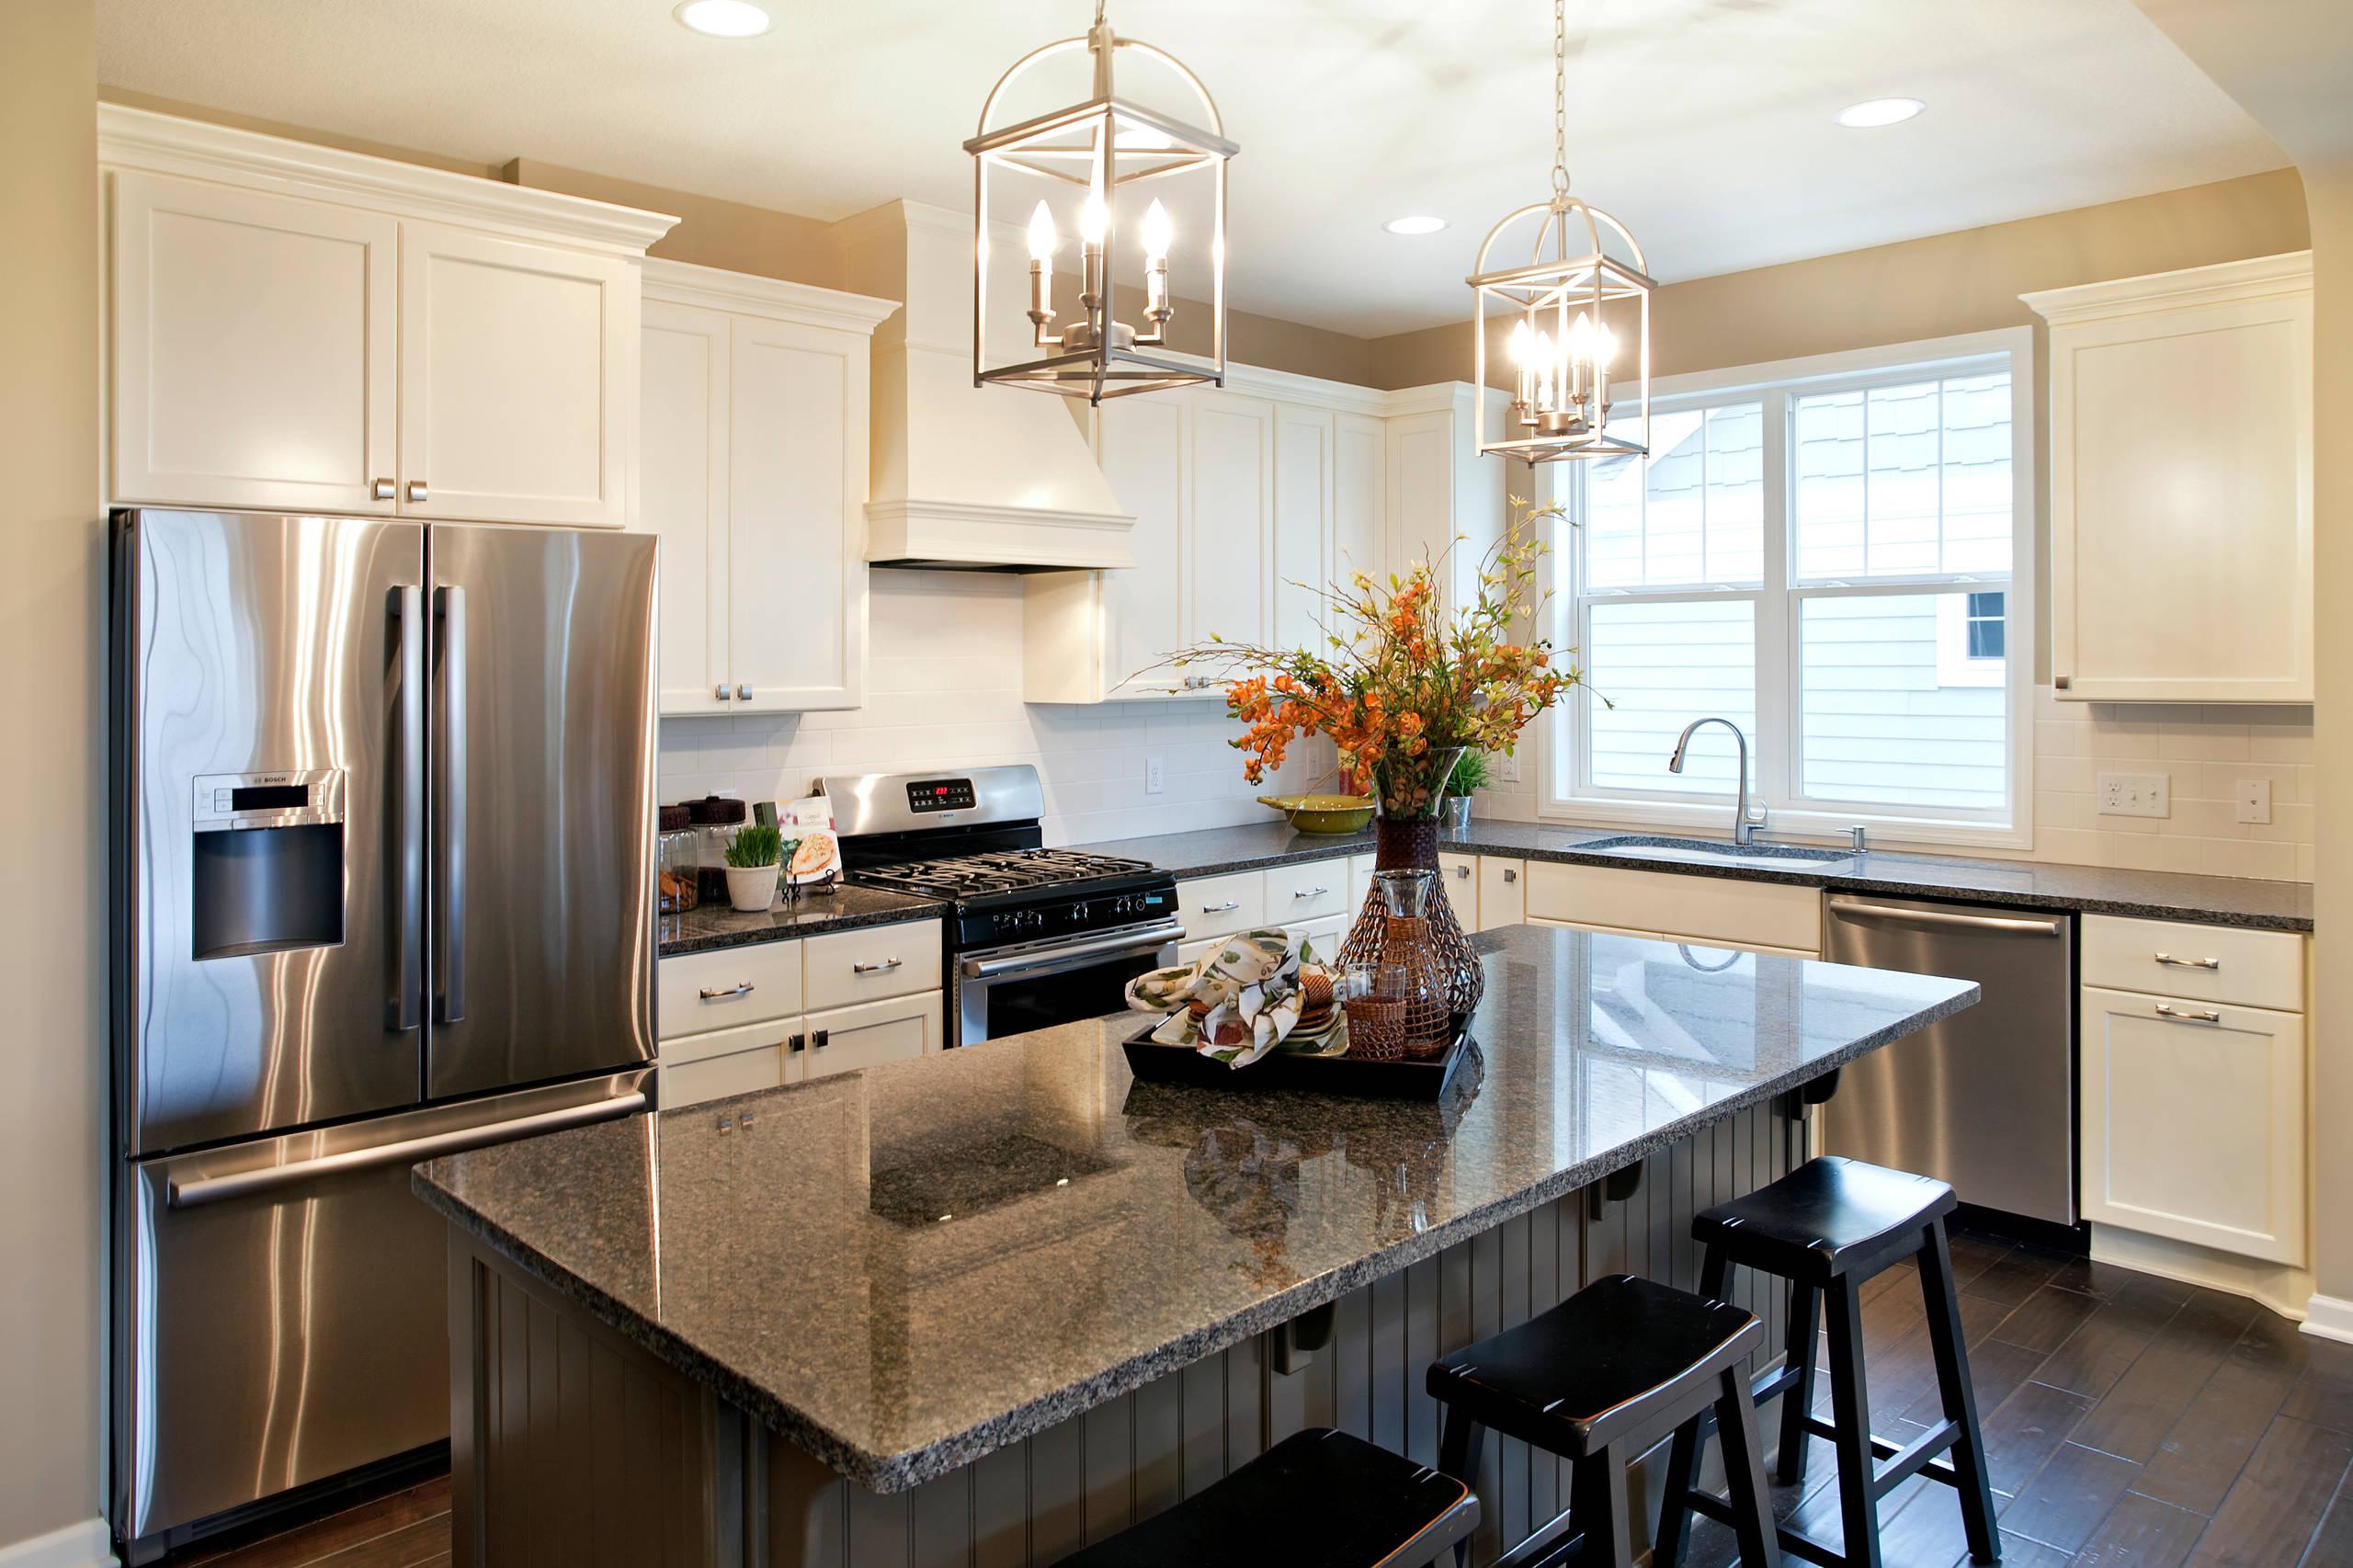 Model Home Kitchens Houzz